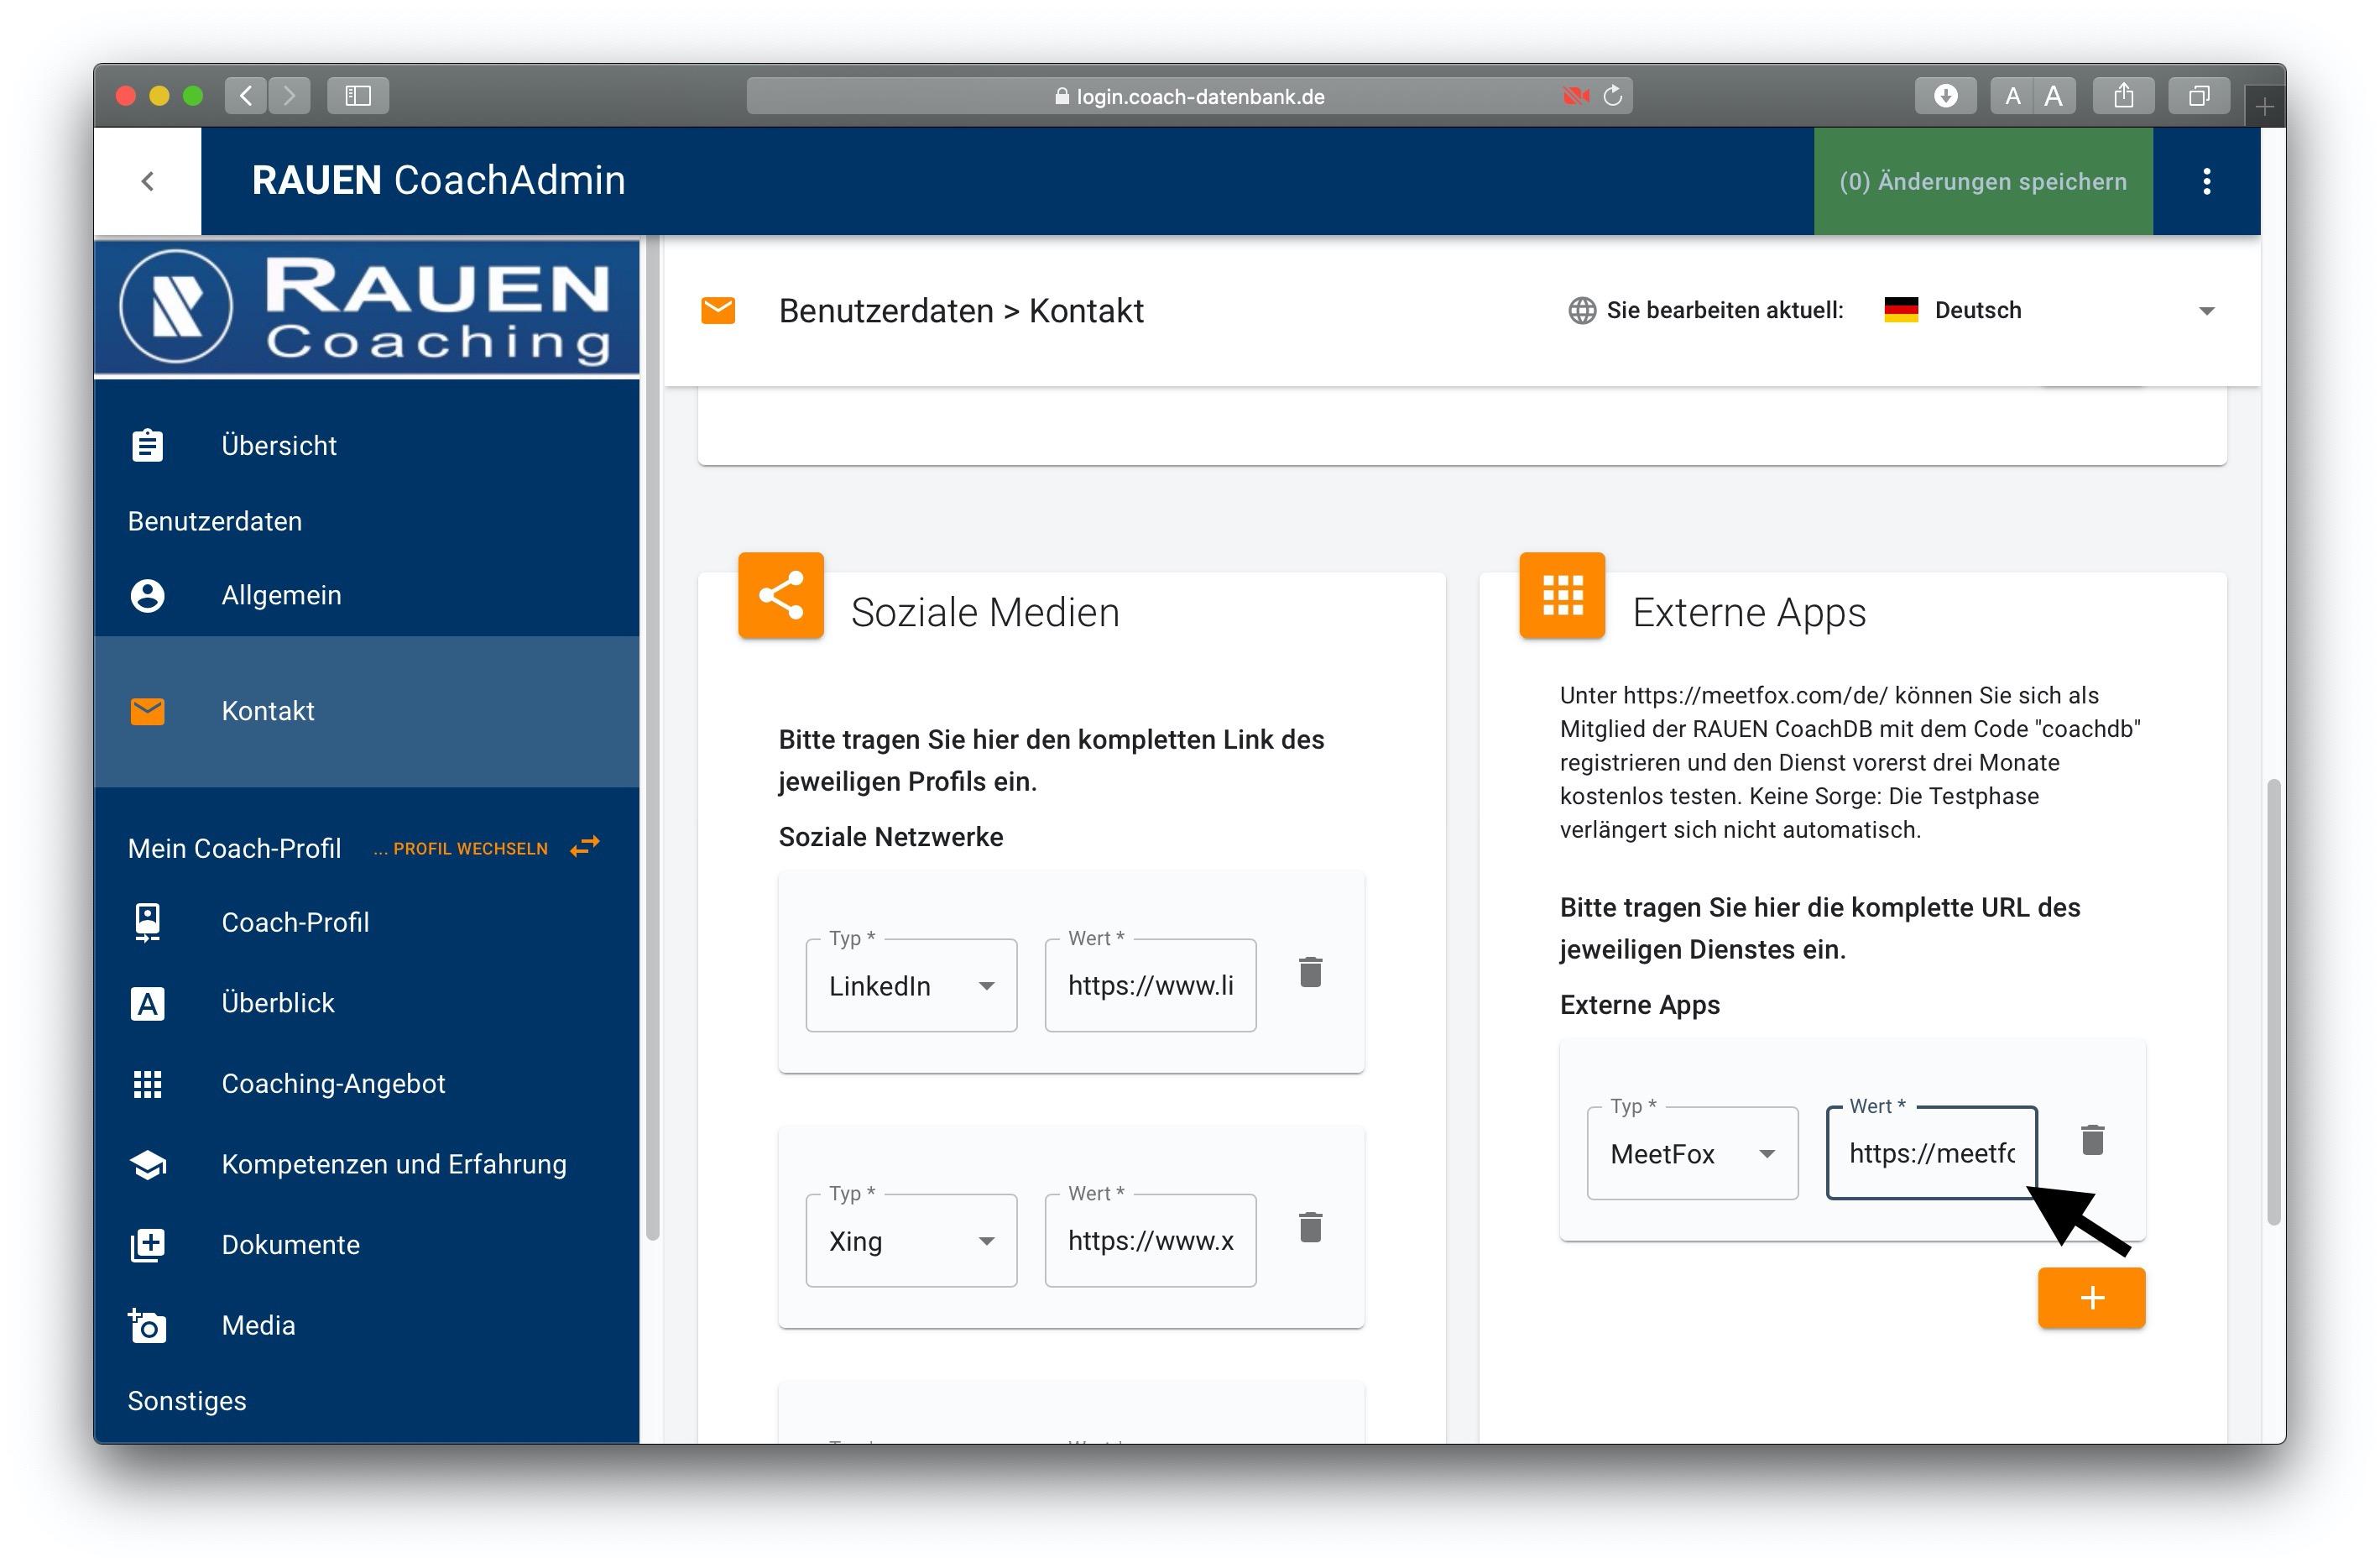 MeetFox integration on RAUEN Coach Database